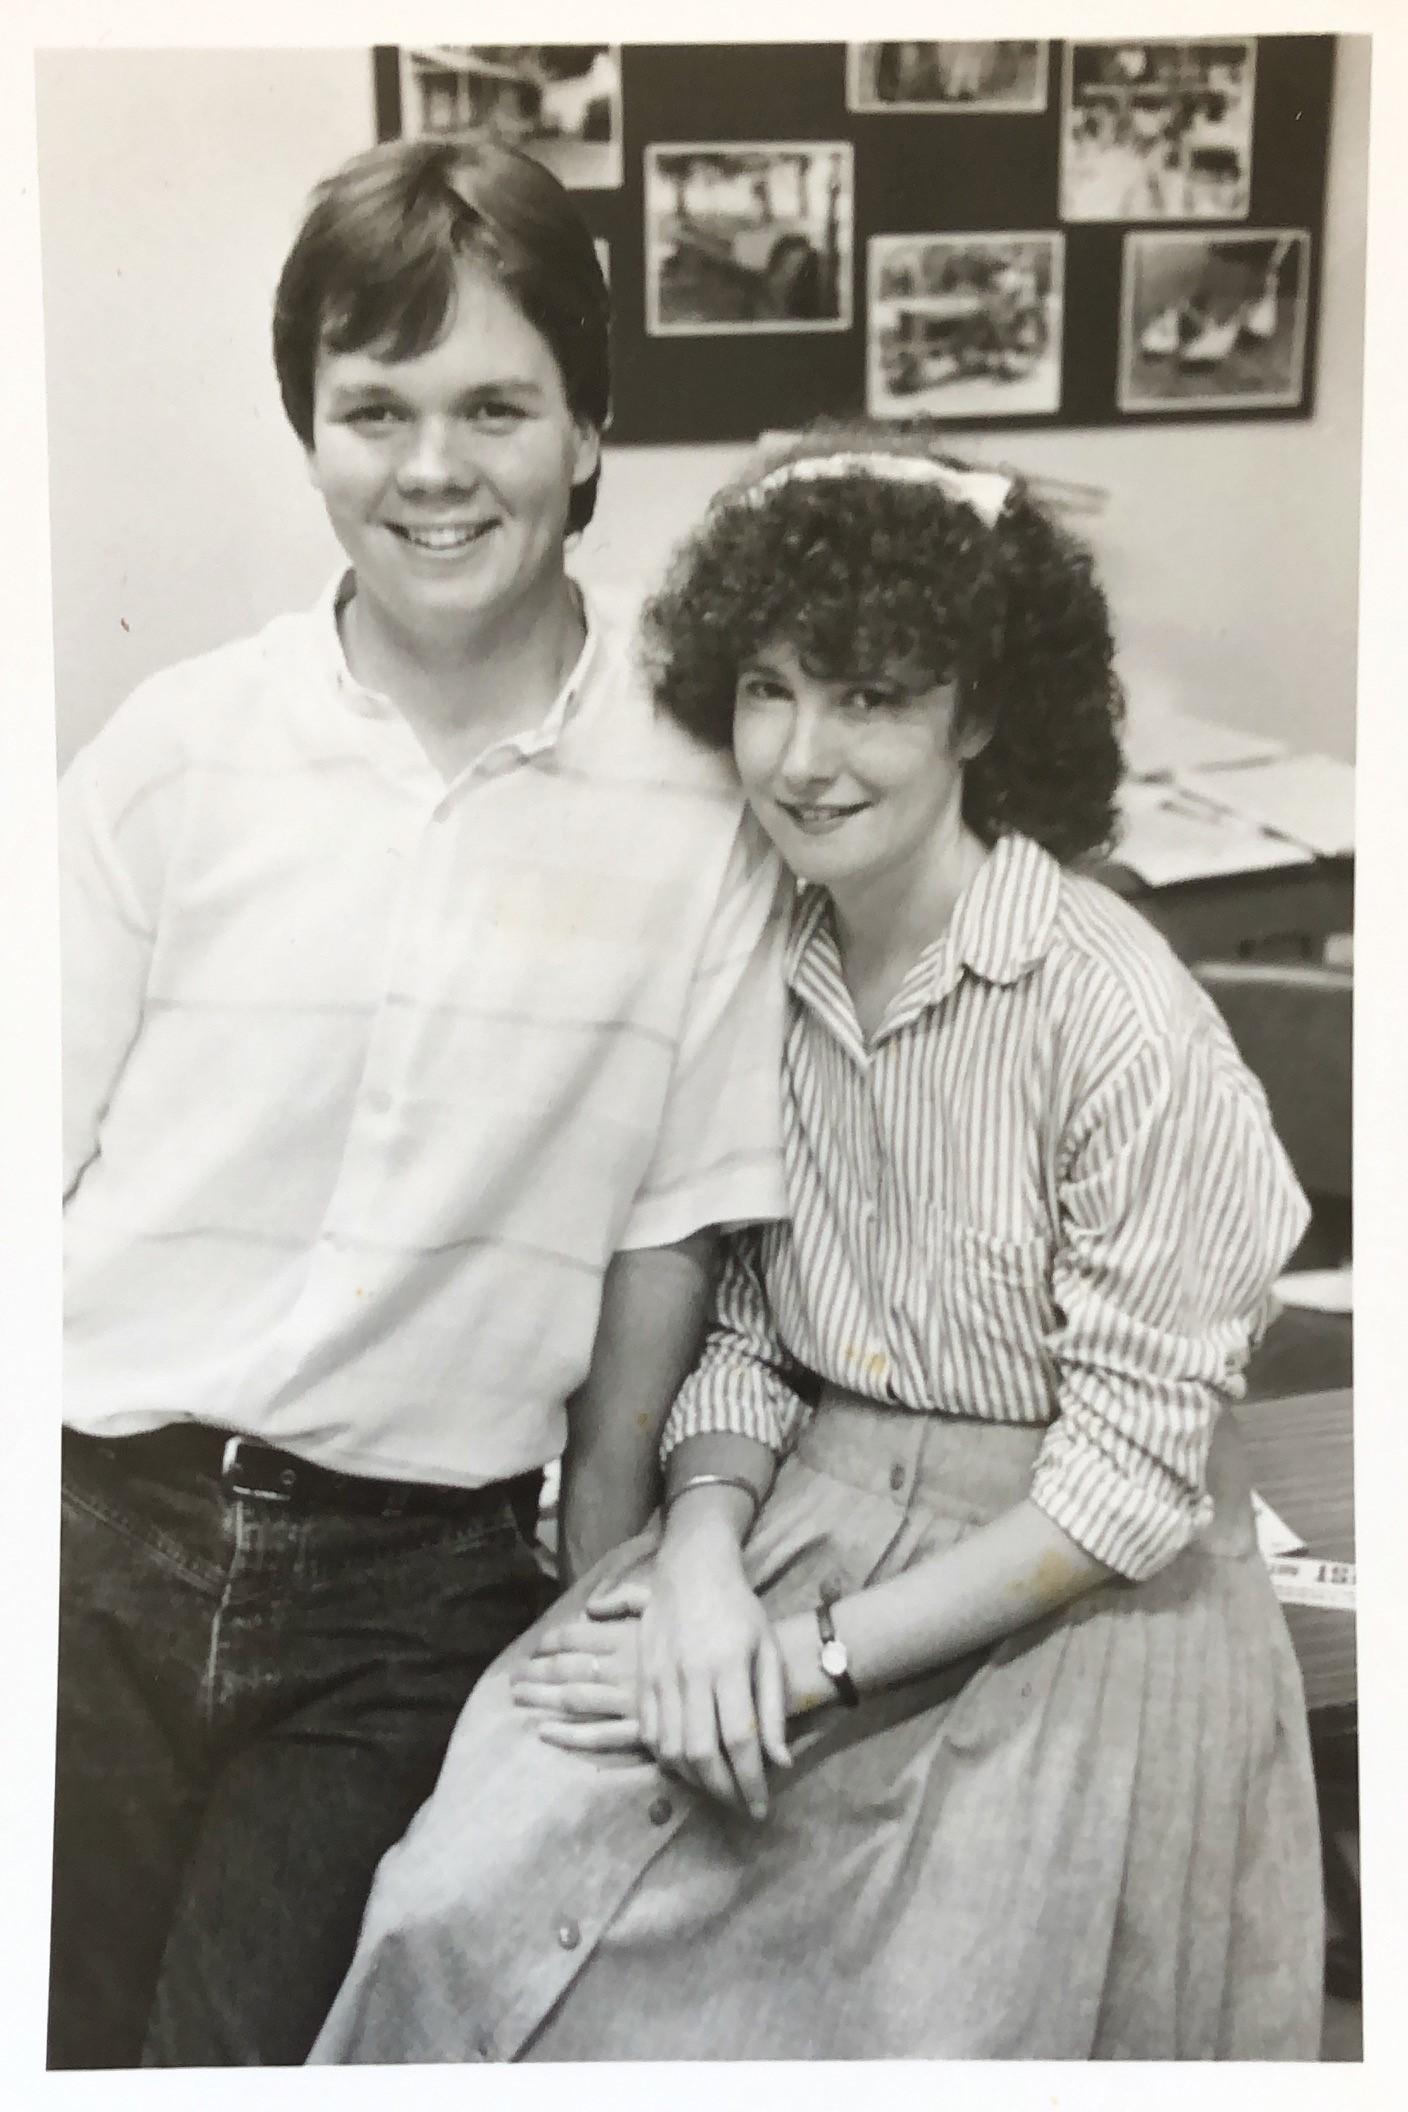 Bruce and Margot Rasmussen